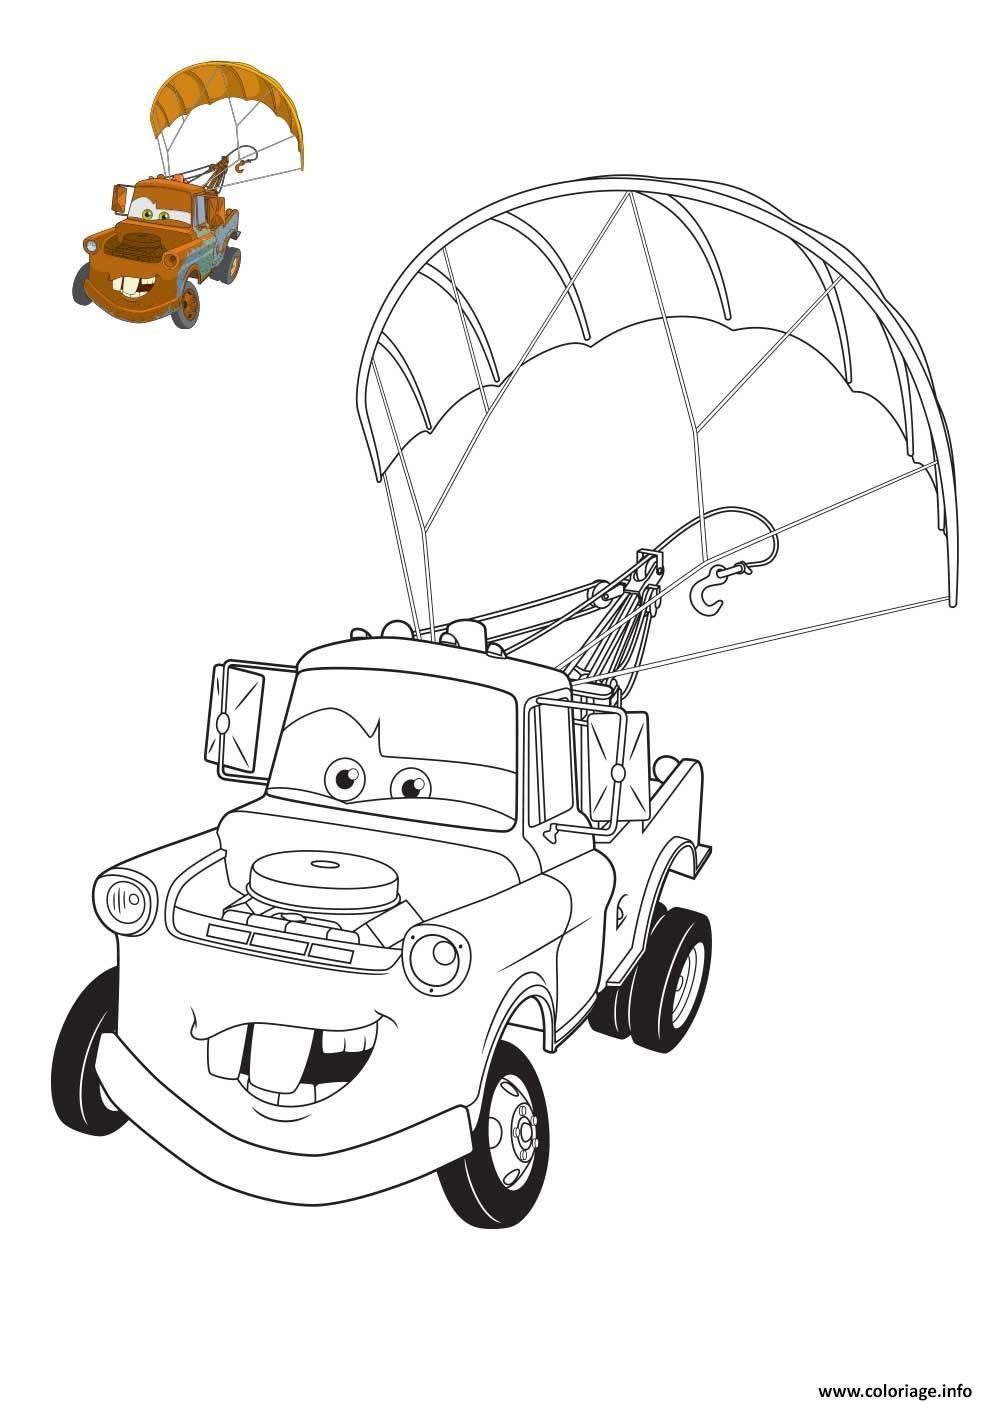 Coloriage film cars 3 martin la depanneuse avec dessin a - Dessin de cars ...